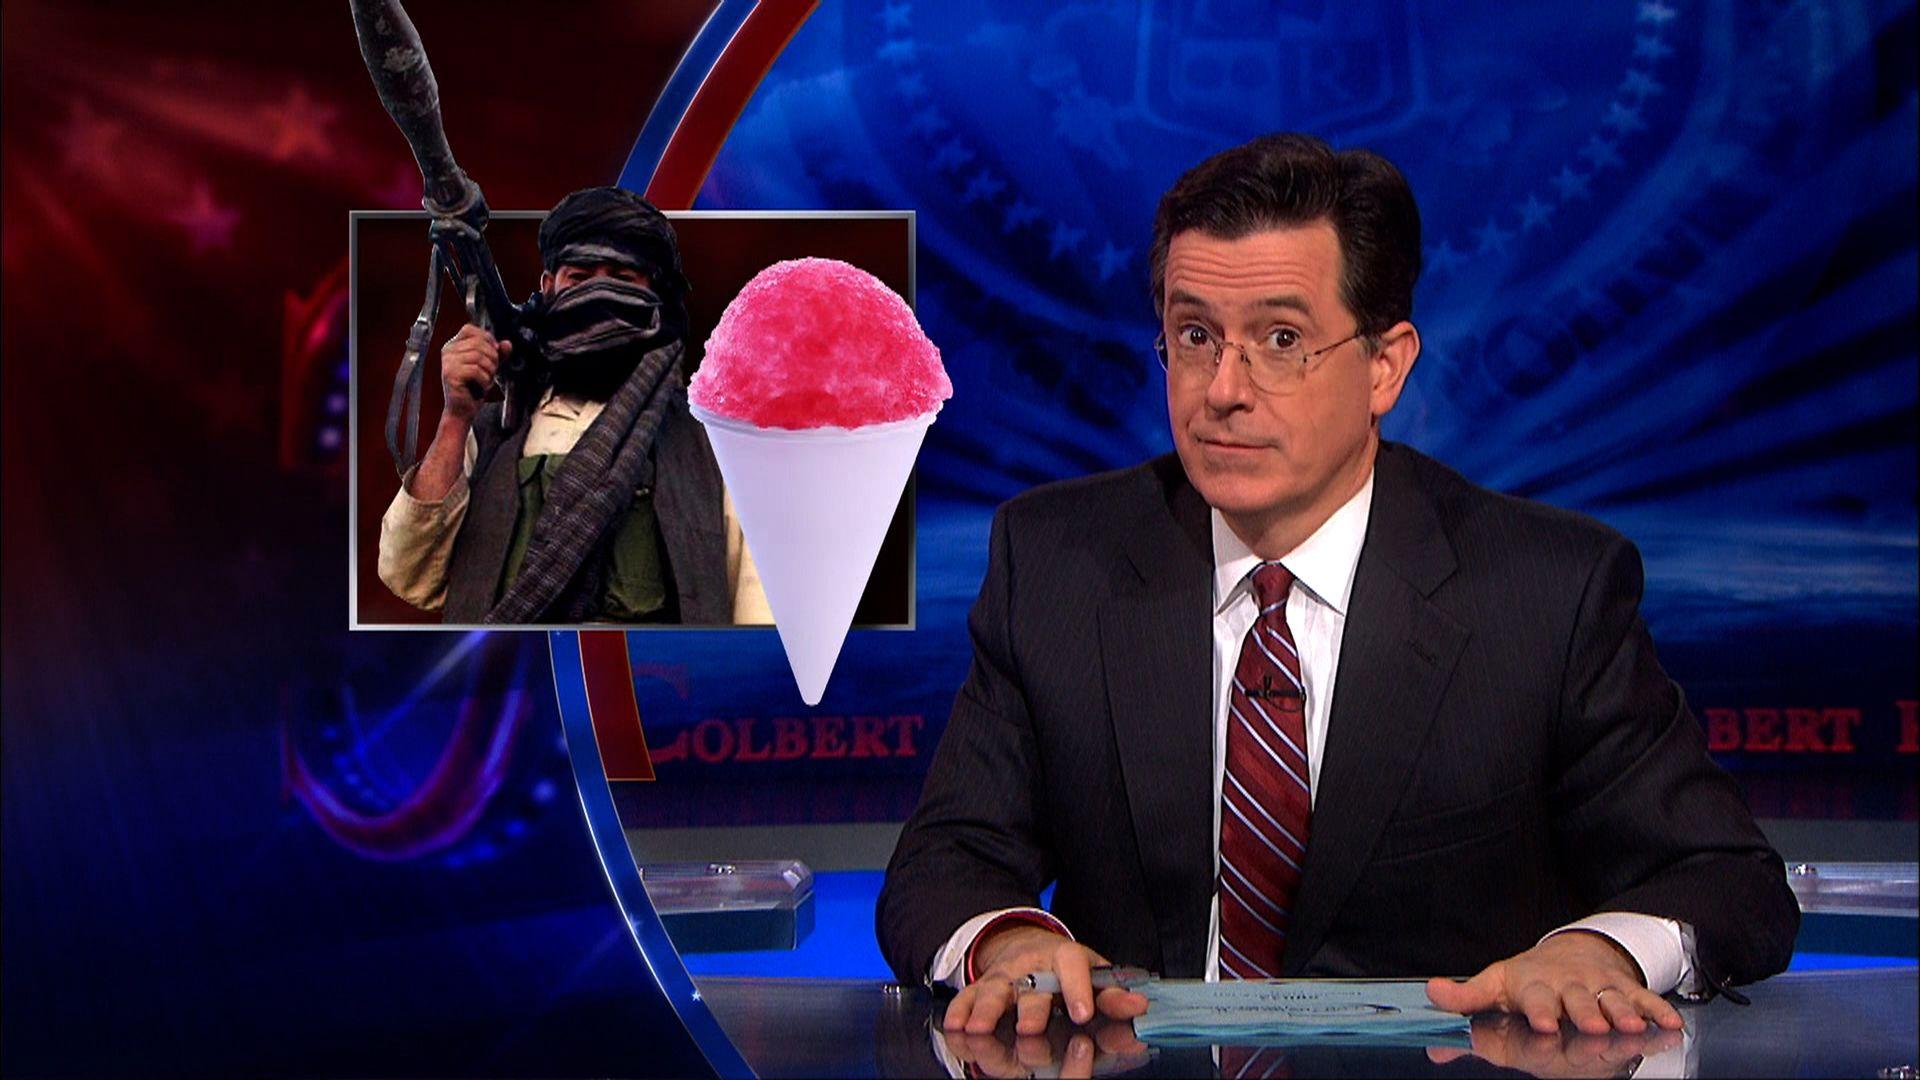 Michigan's Snow Cone Machines - The Colbert Report | Comedy Central